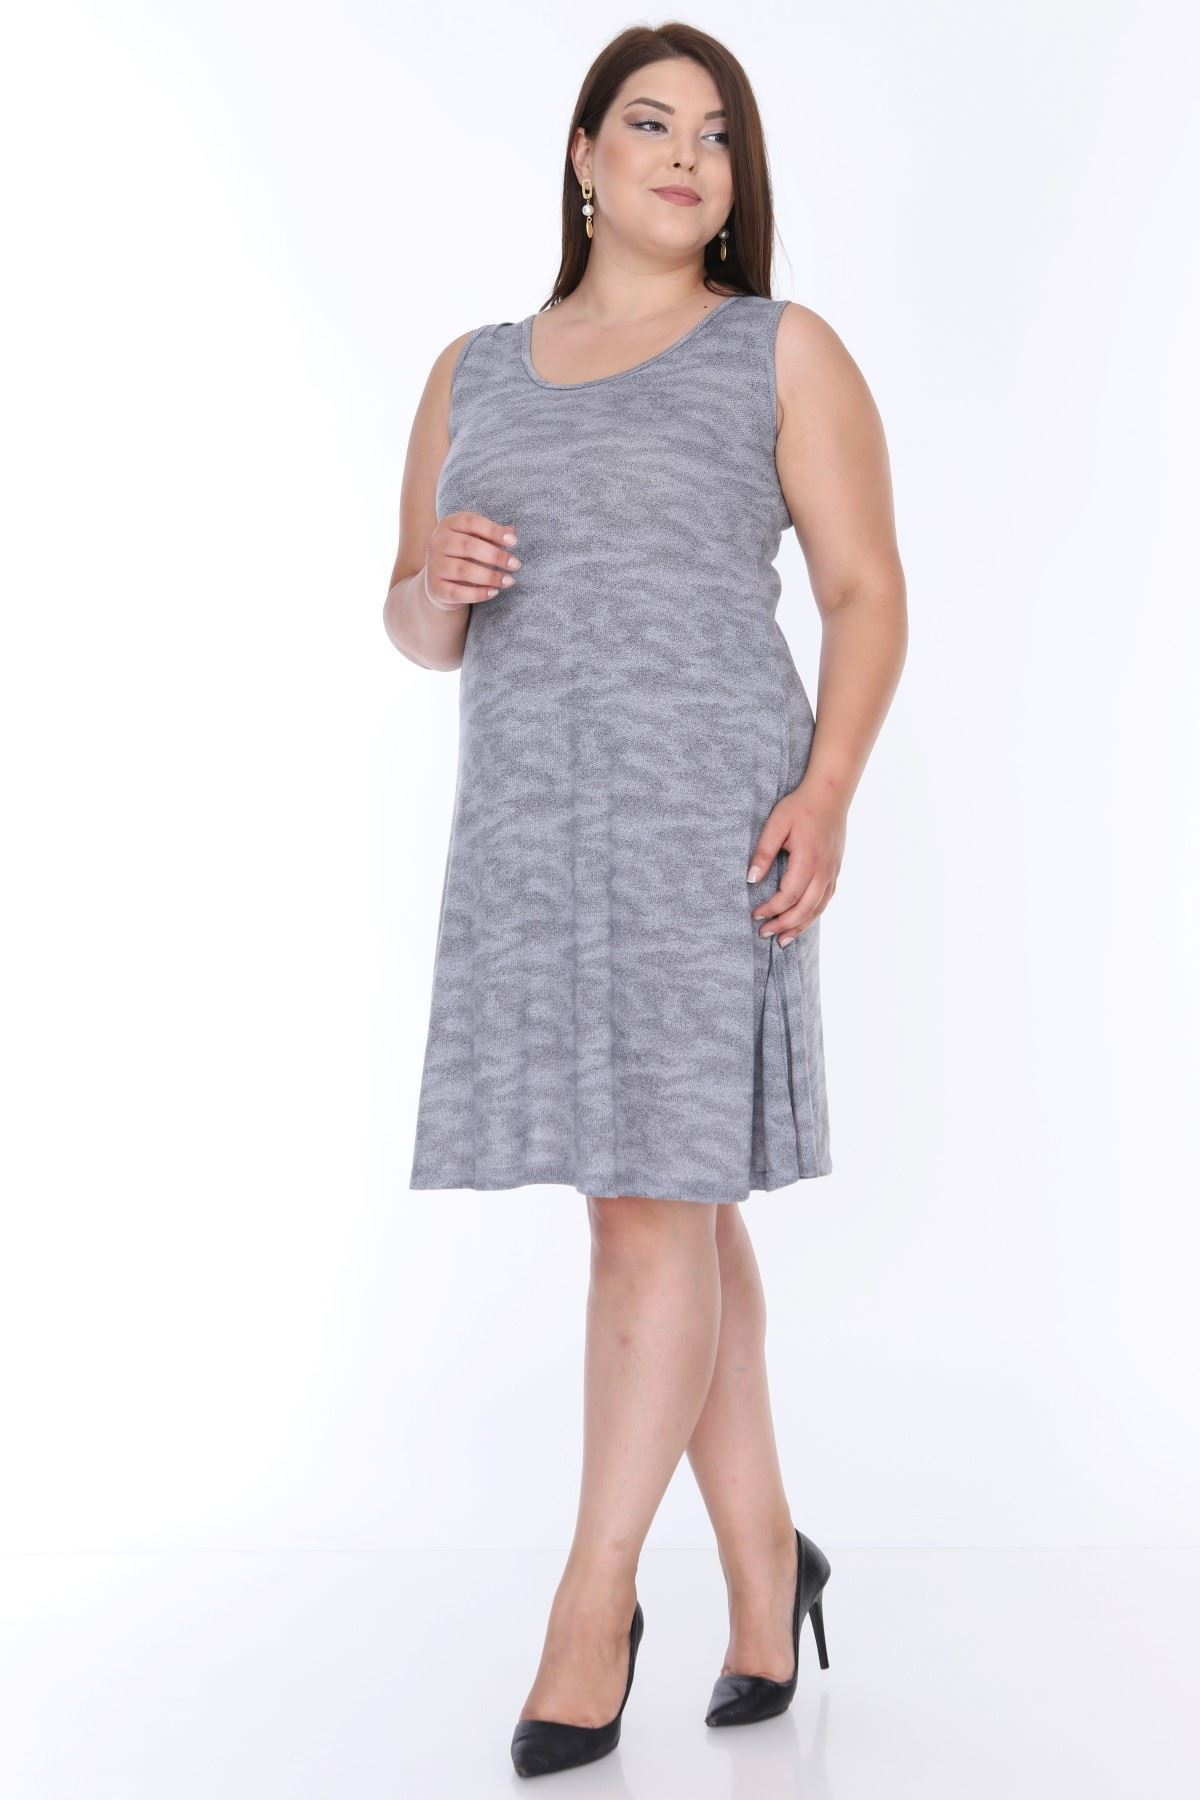 Gri Kolsuz Elbise 6B-0641